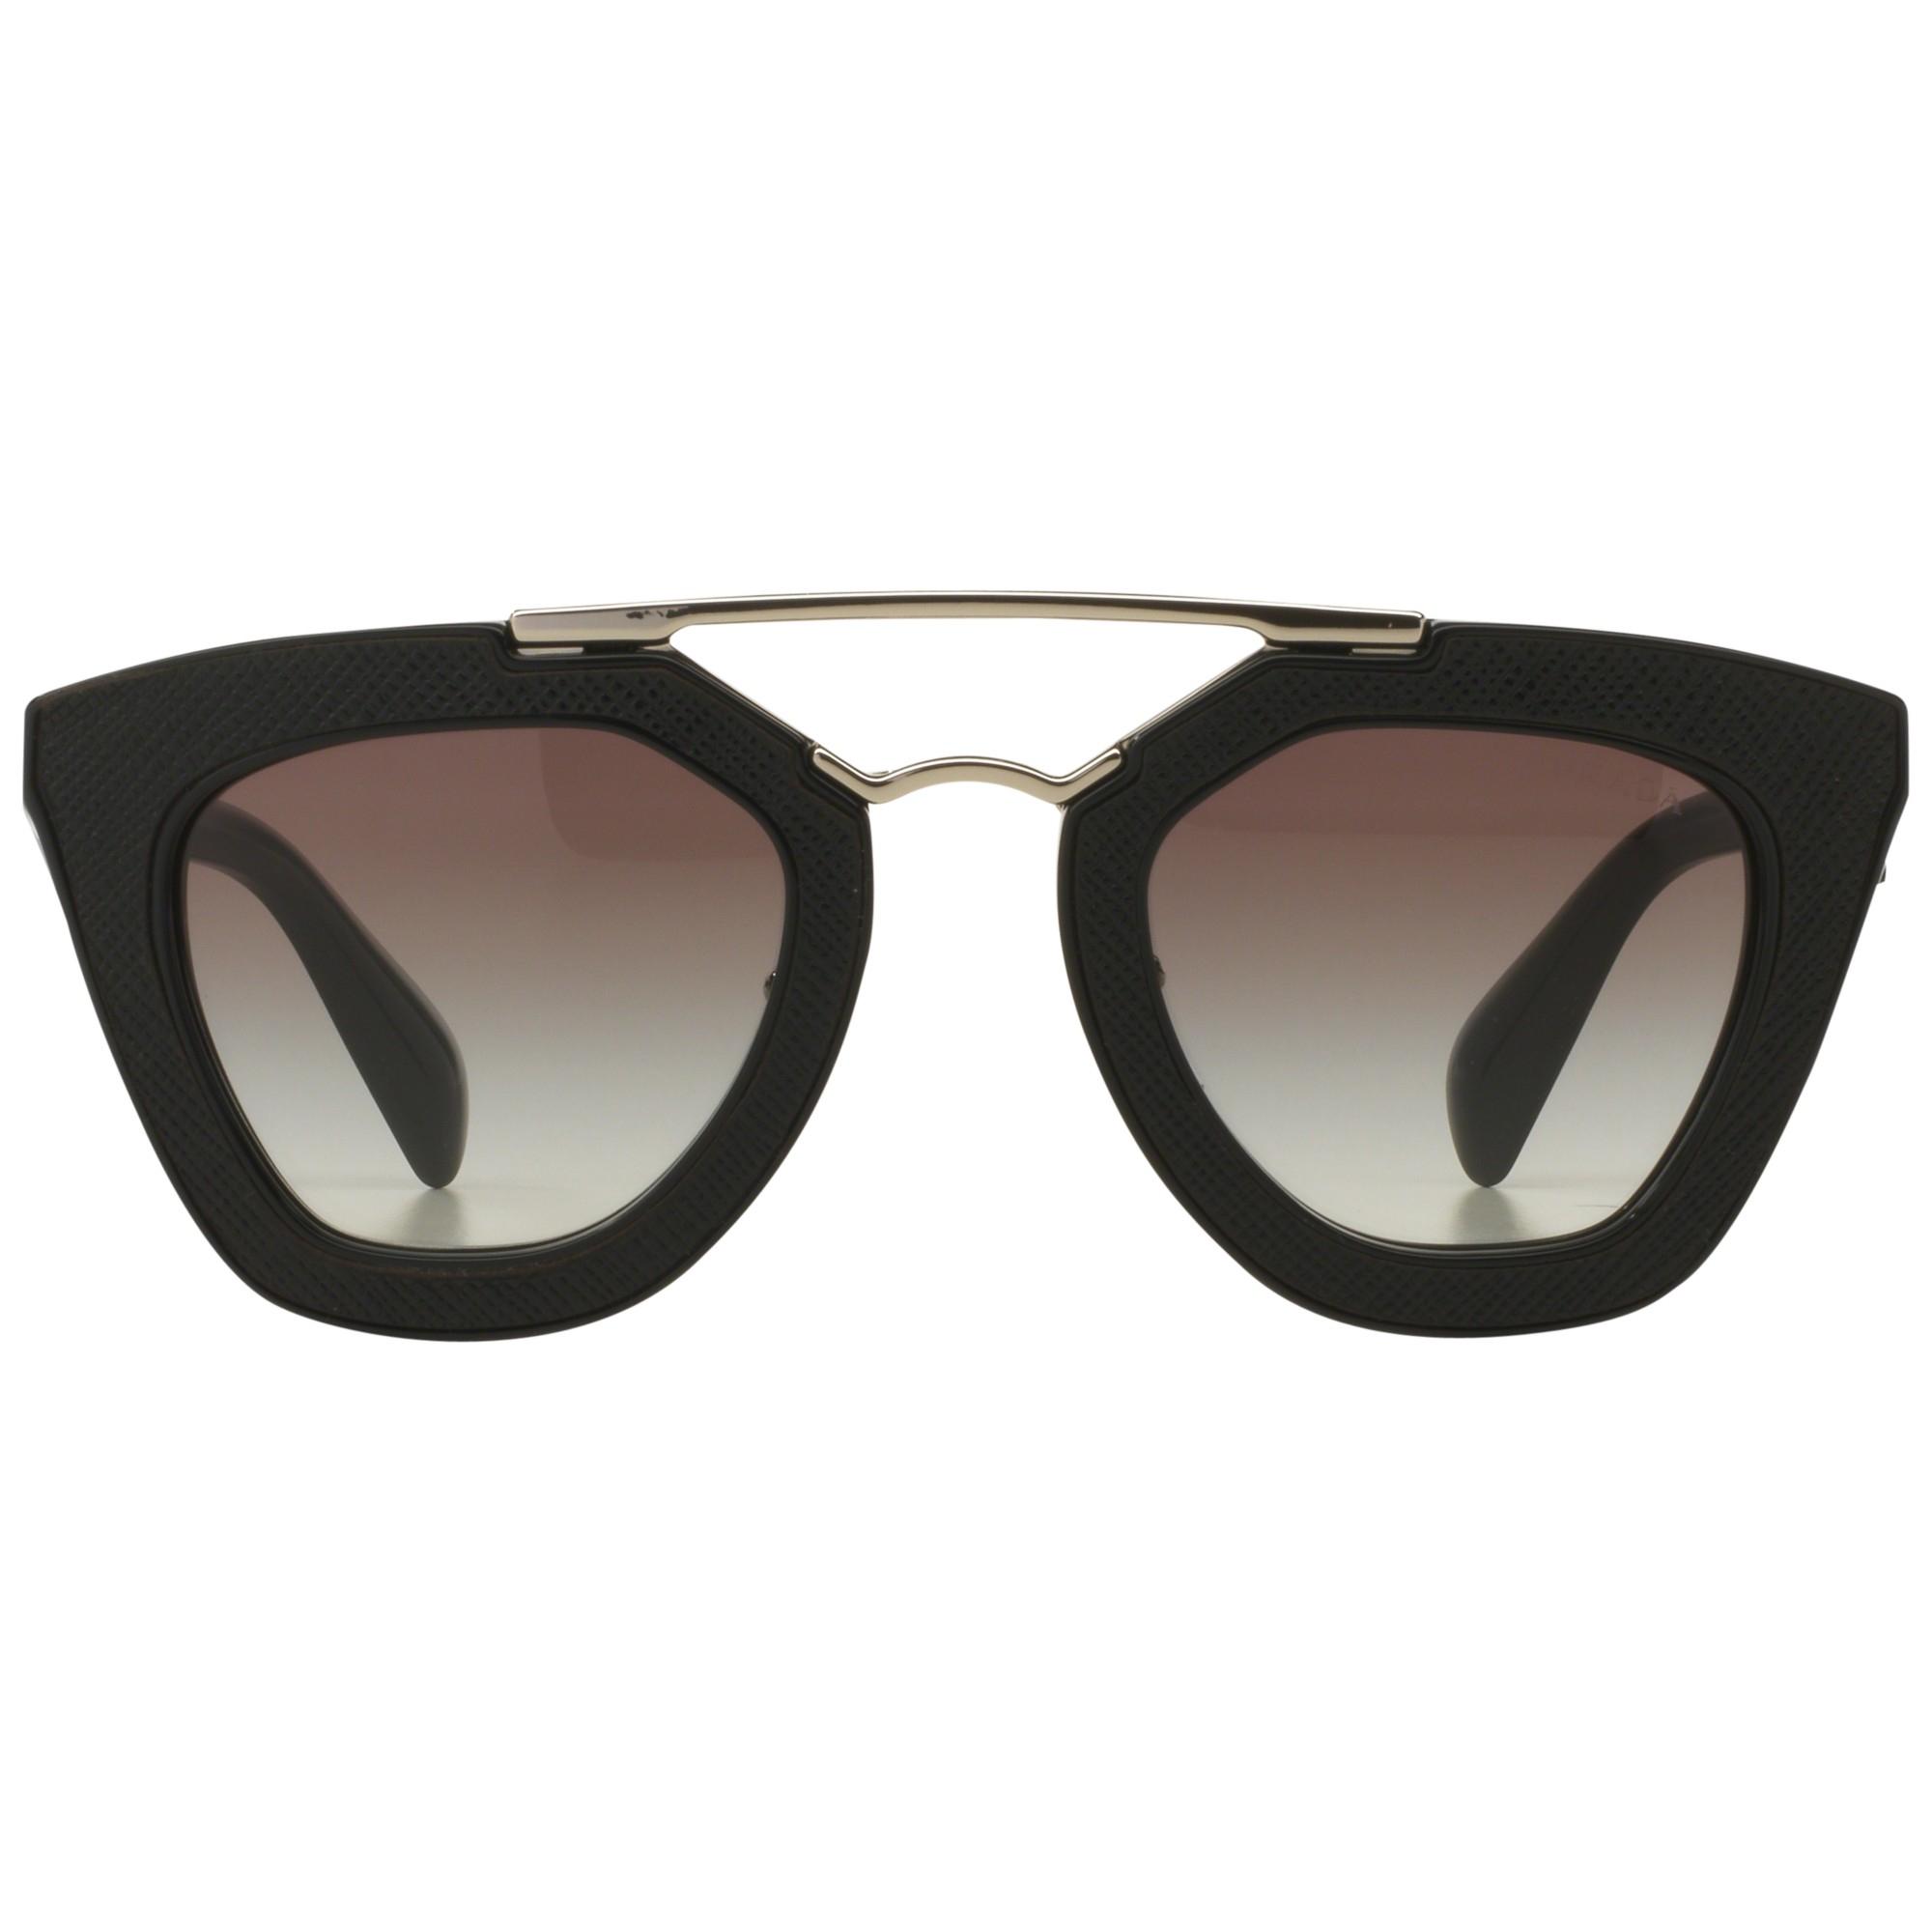 Lyst - Prada Pr14ss D-frame Sunglasses in Black